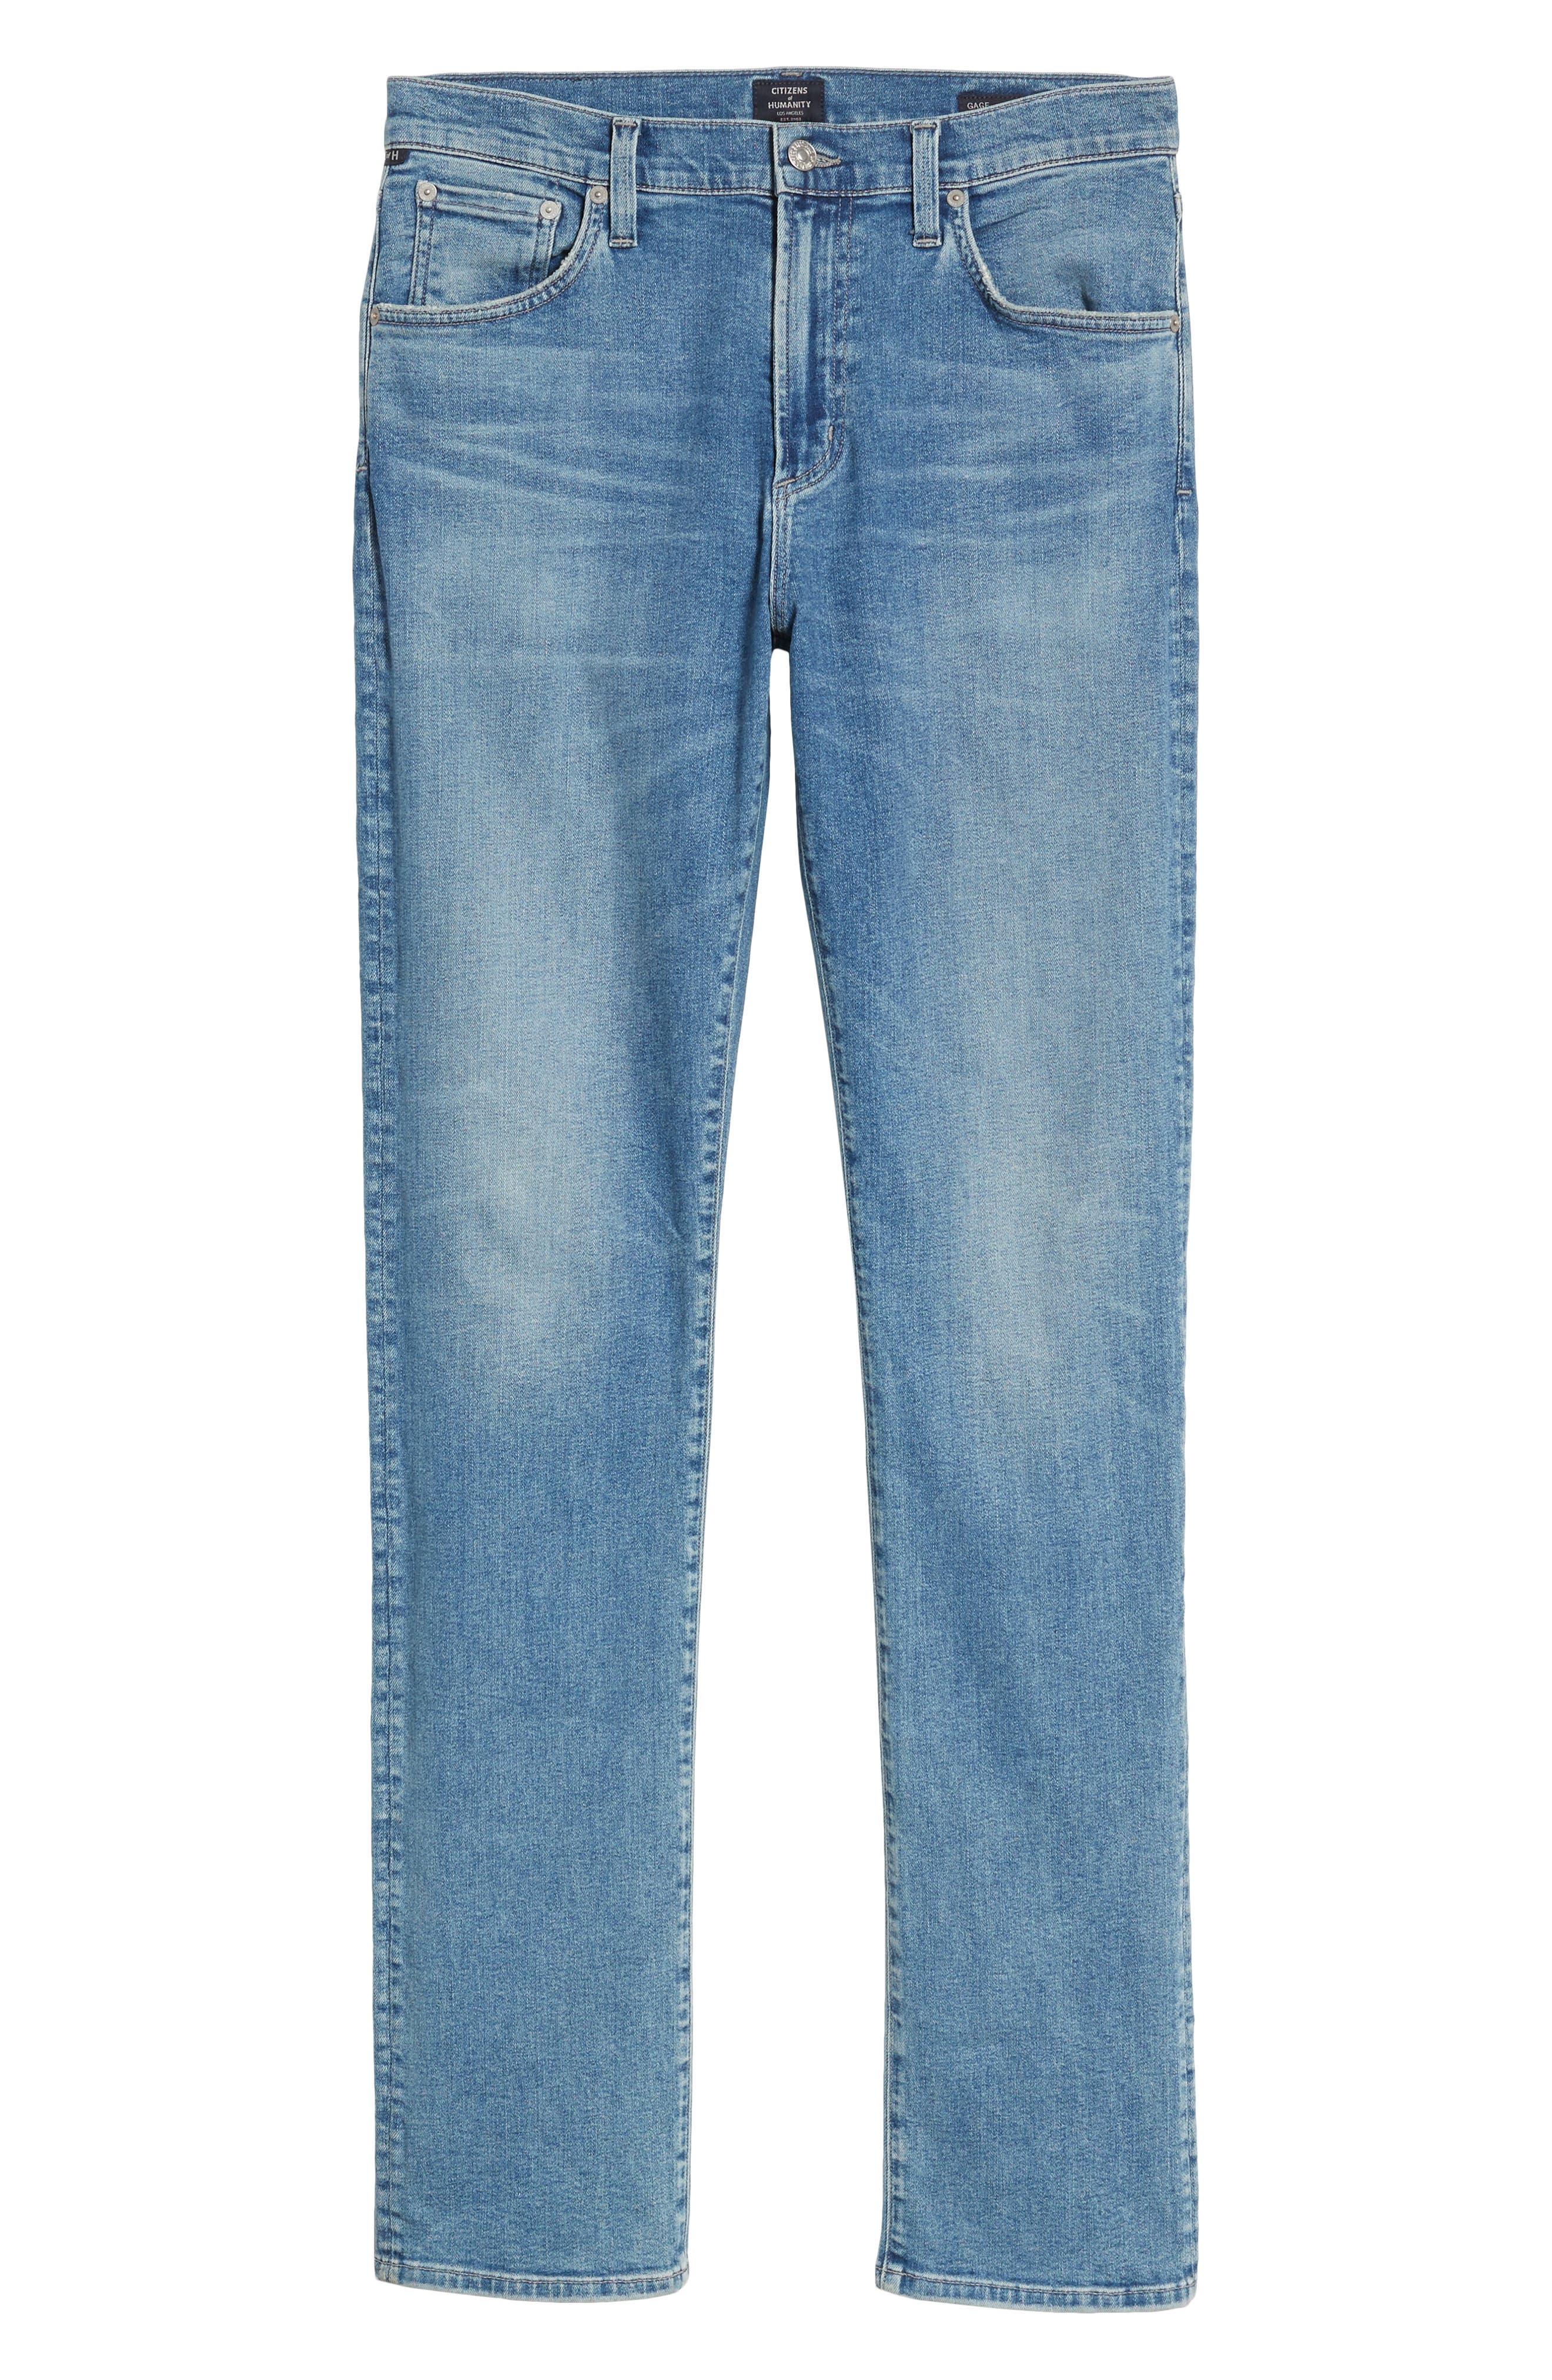 Perform - Gage Slim Straight Leg Jeans,                             Alternate thumbnail 6, color,                             473